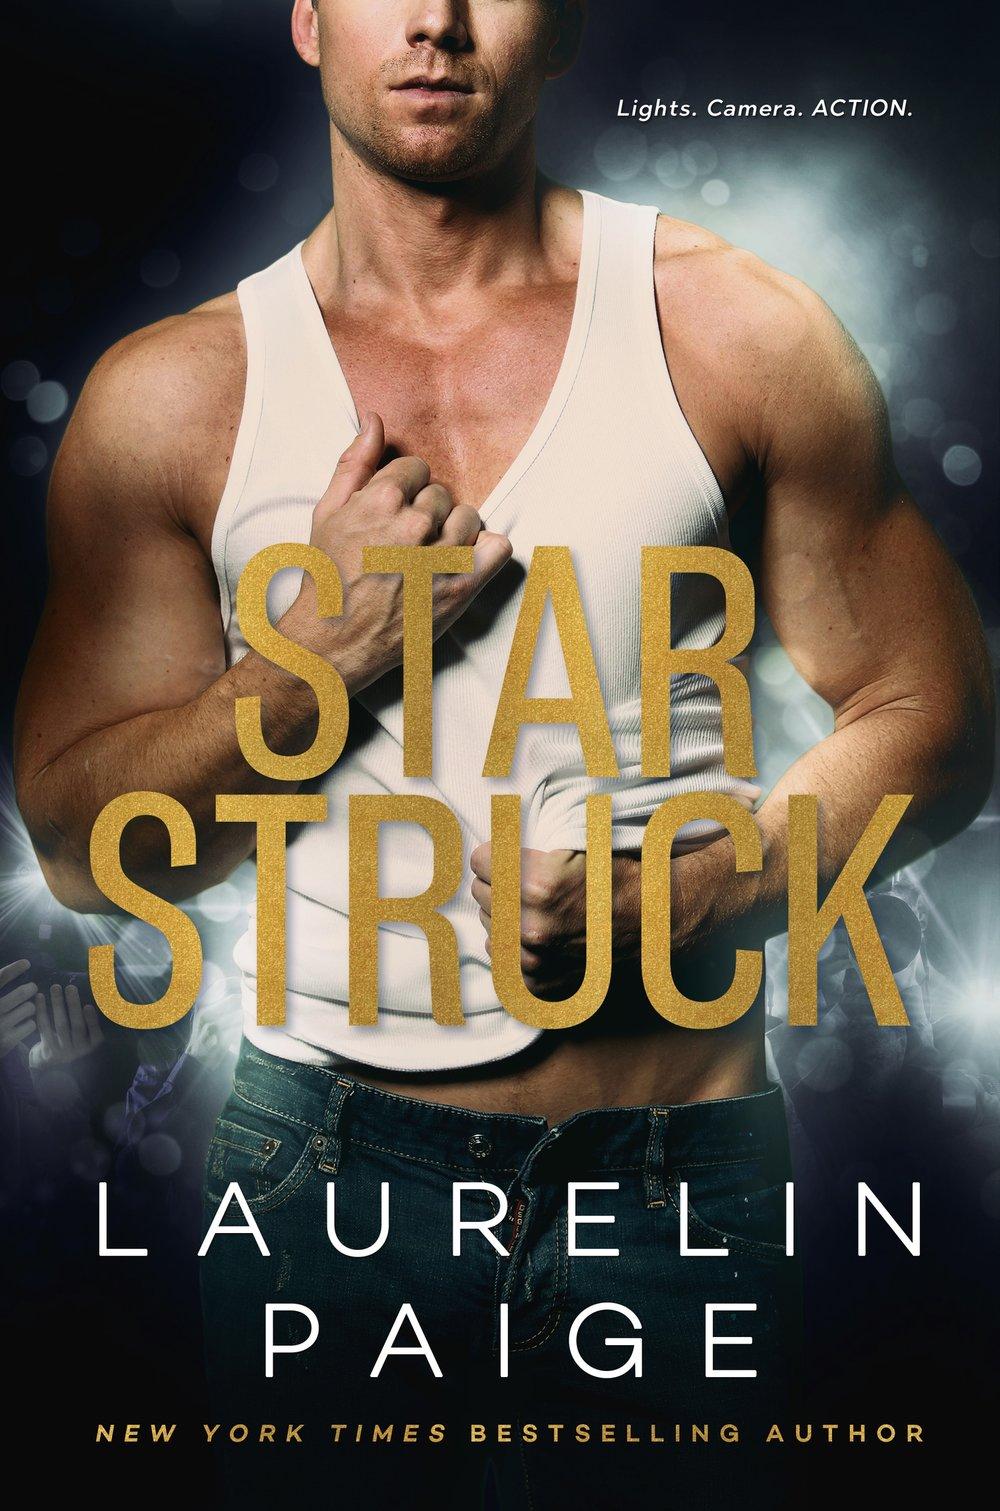 LPStarStruckBookCover55x825_MEDIUM-NEW.jpg